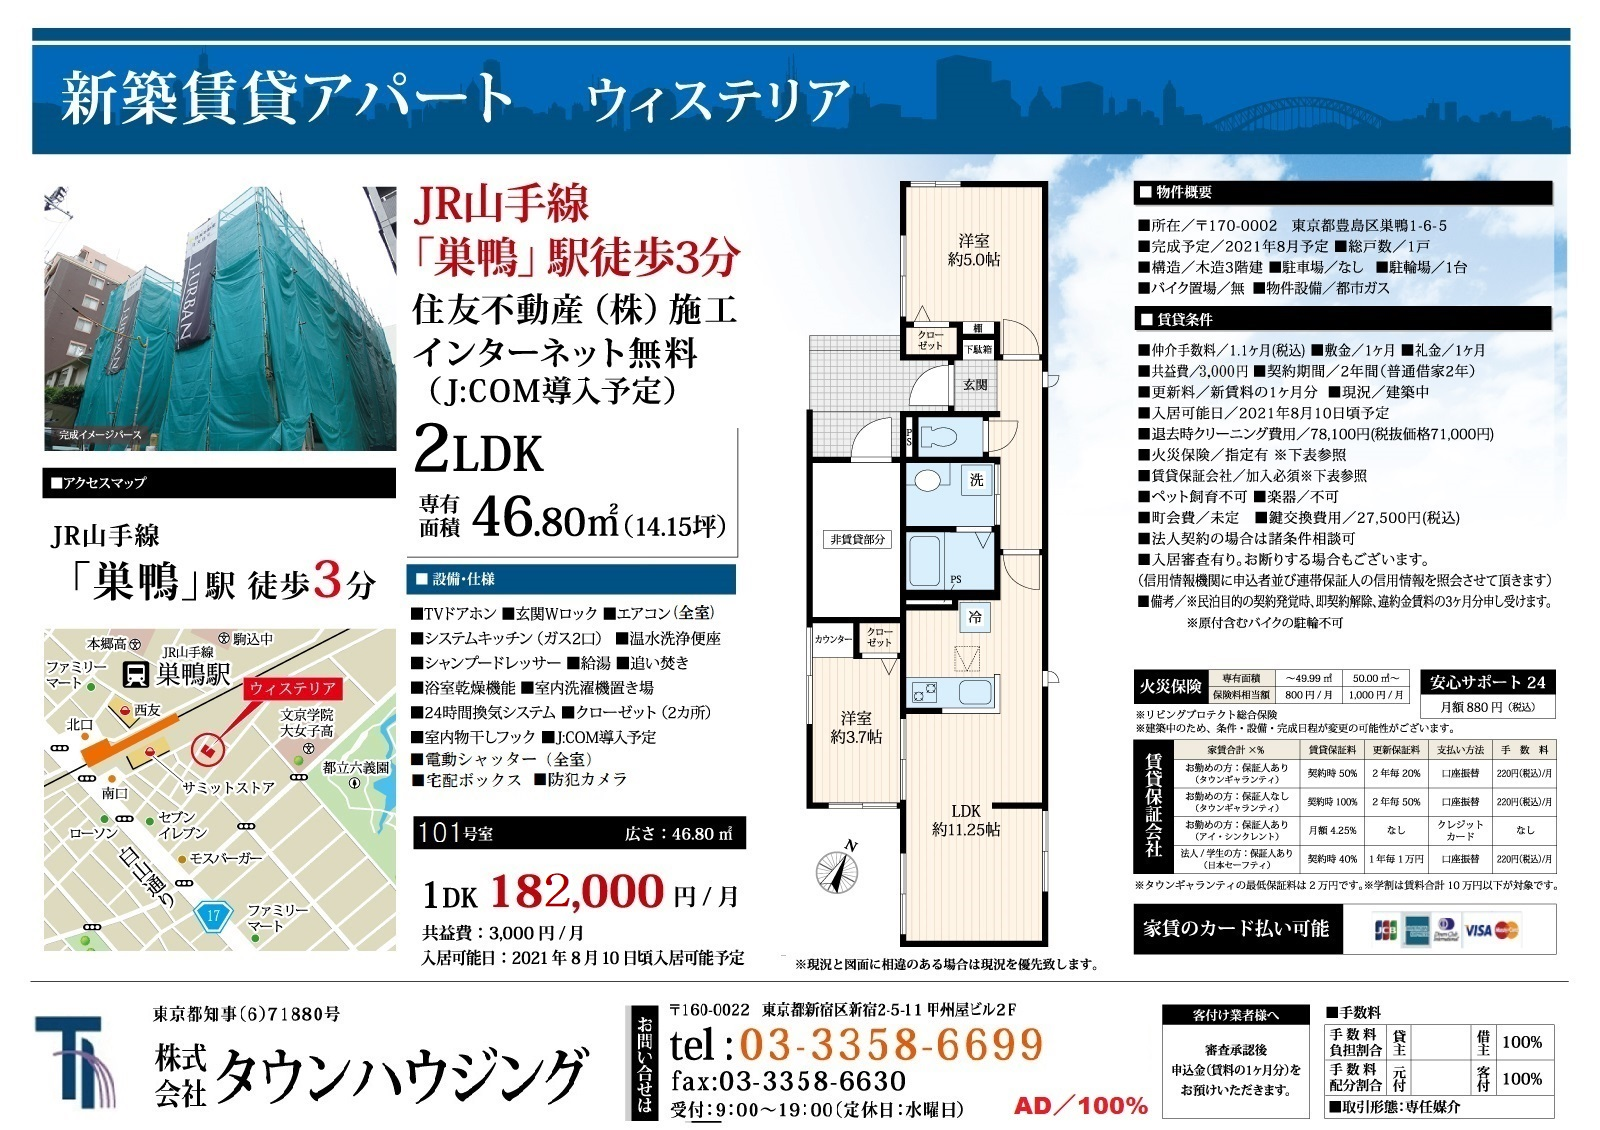 JR山手線 都営三田線 巣鴨駅 徒歩3分 2LDK ネット無料